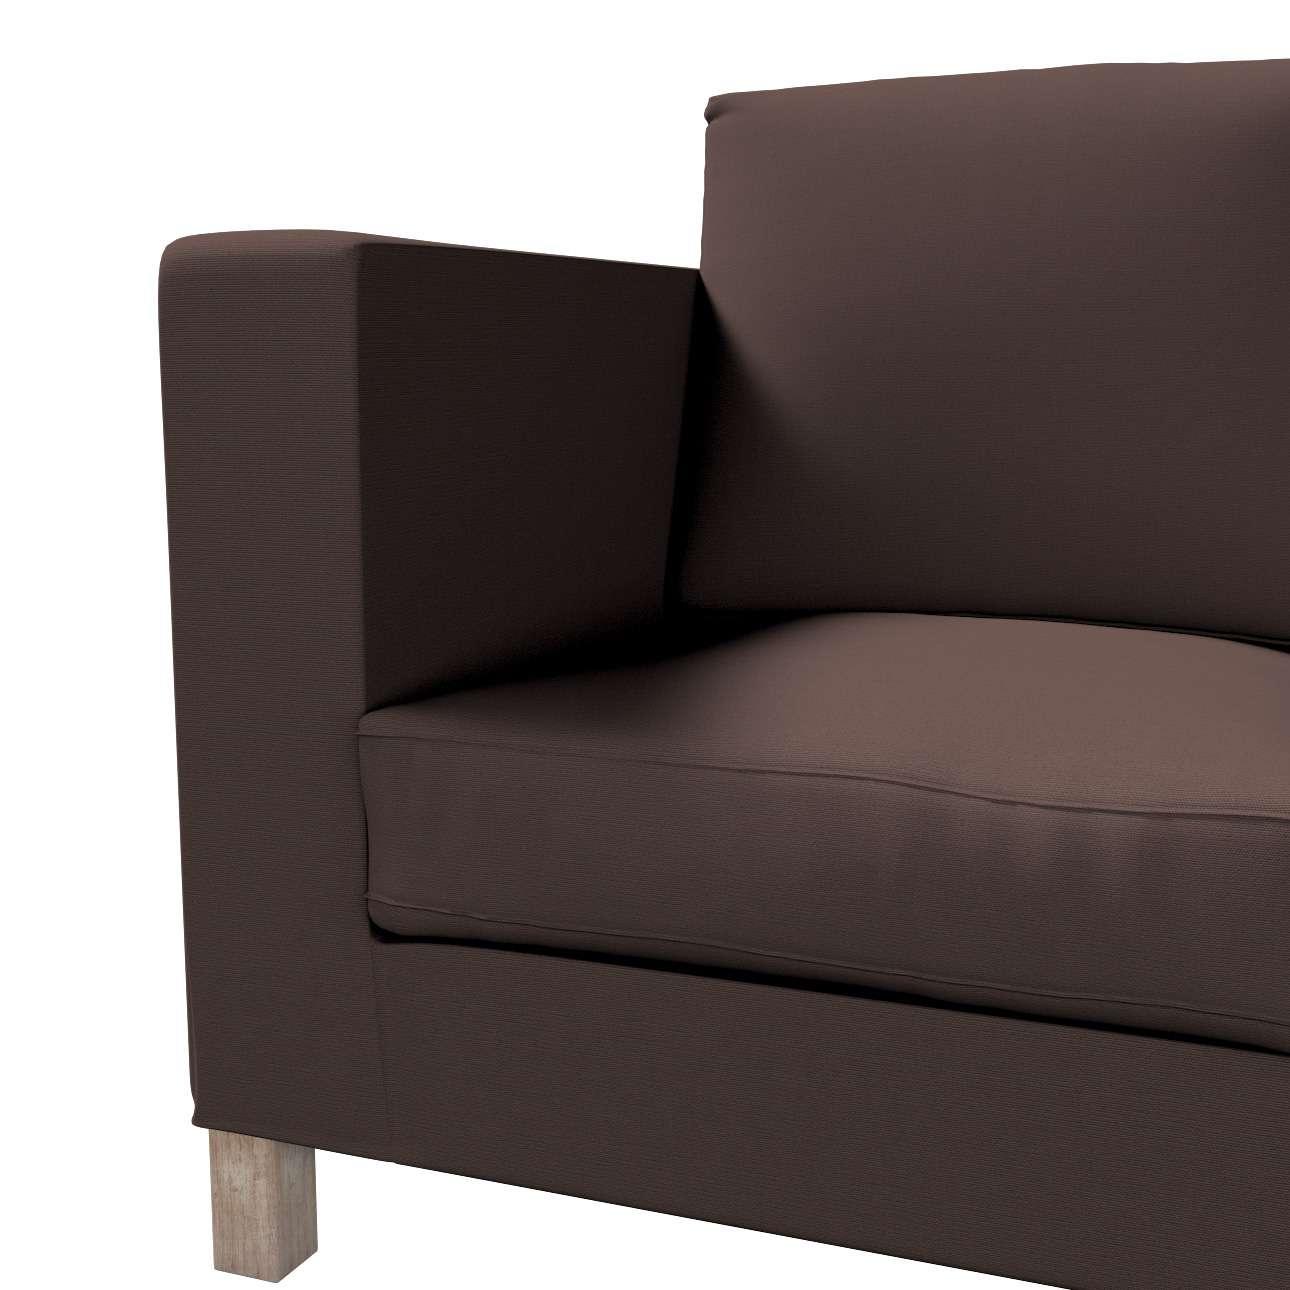 Karlanda klädsel <br>3-sits soffa - kort klädsel i kollektionen Panama Cotton, Tyg: 702-03